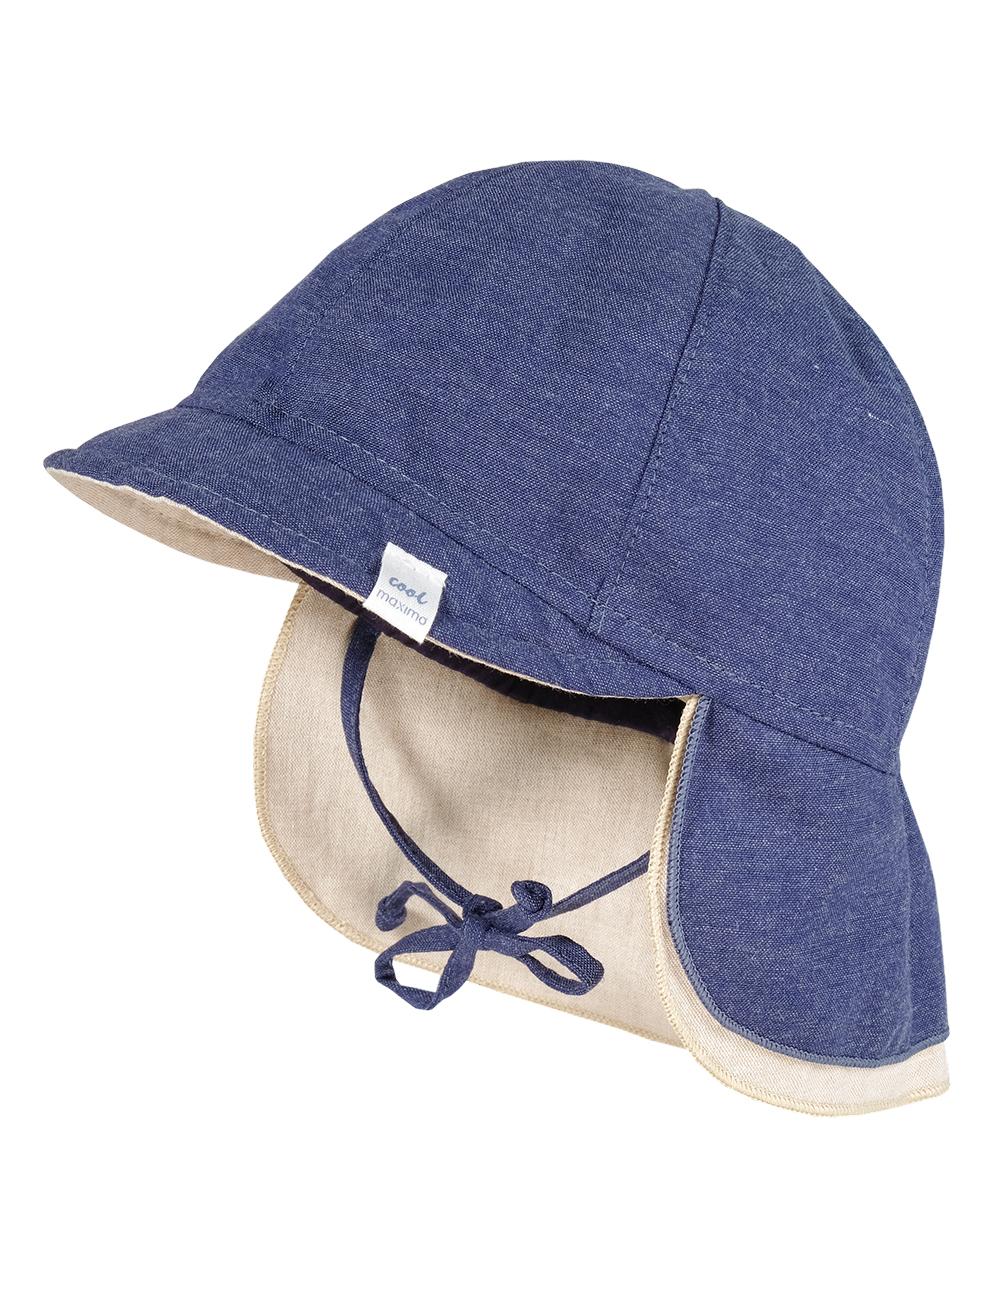 Schildmütze 45 Maximo. Farbe: jeansmeliert, Größe: 45